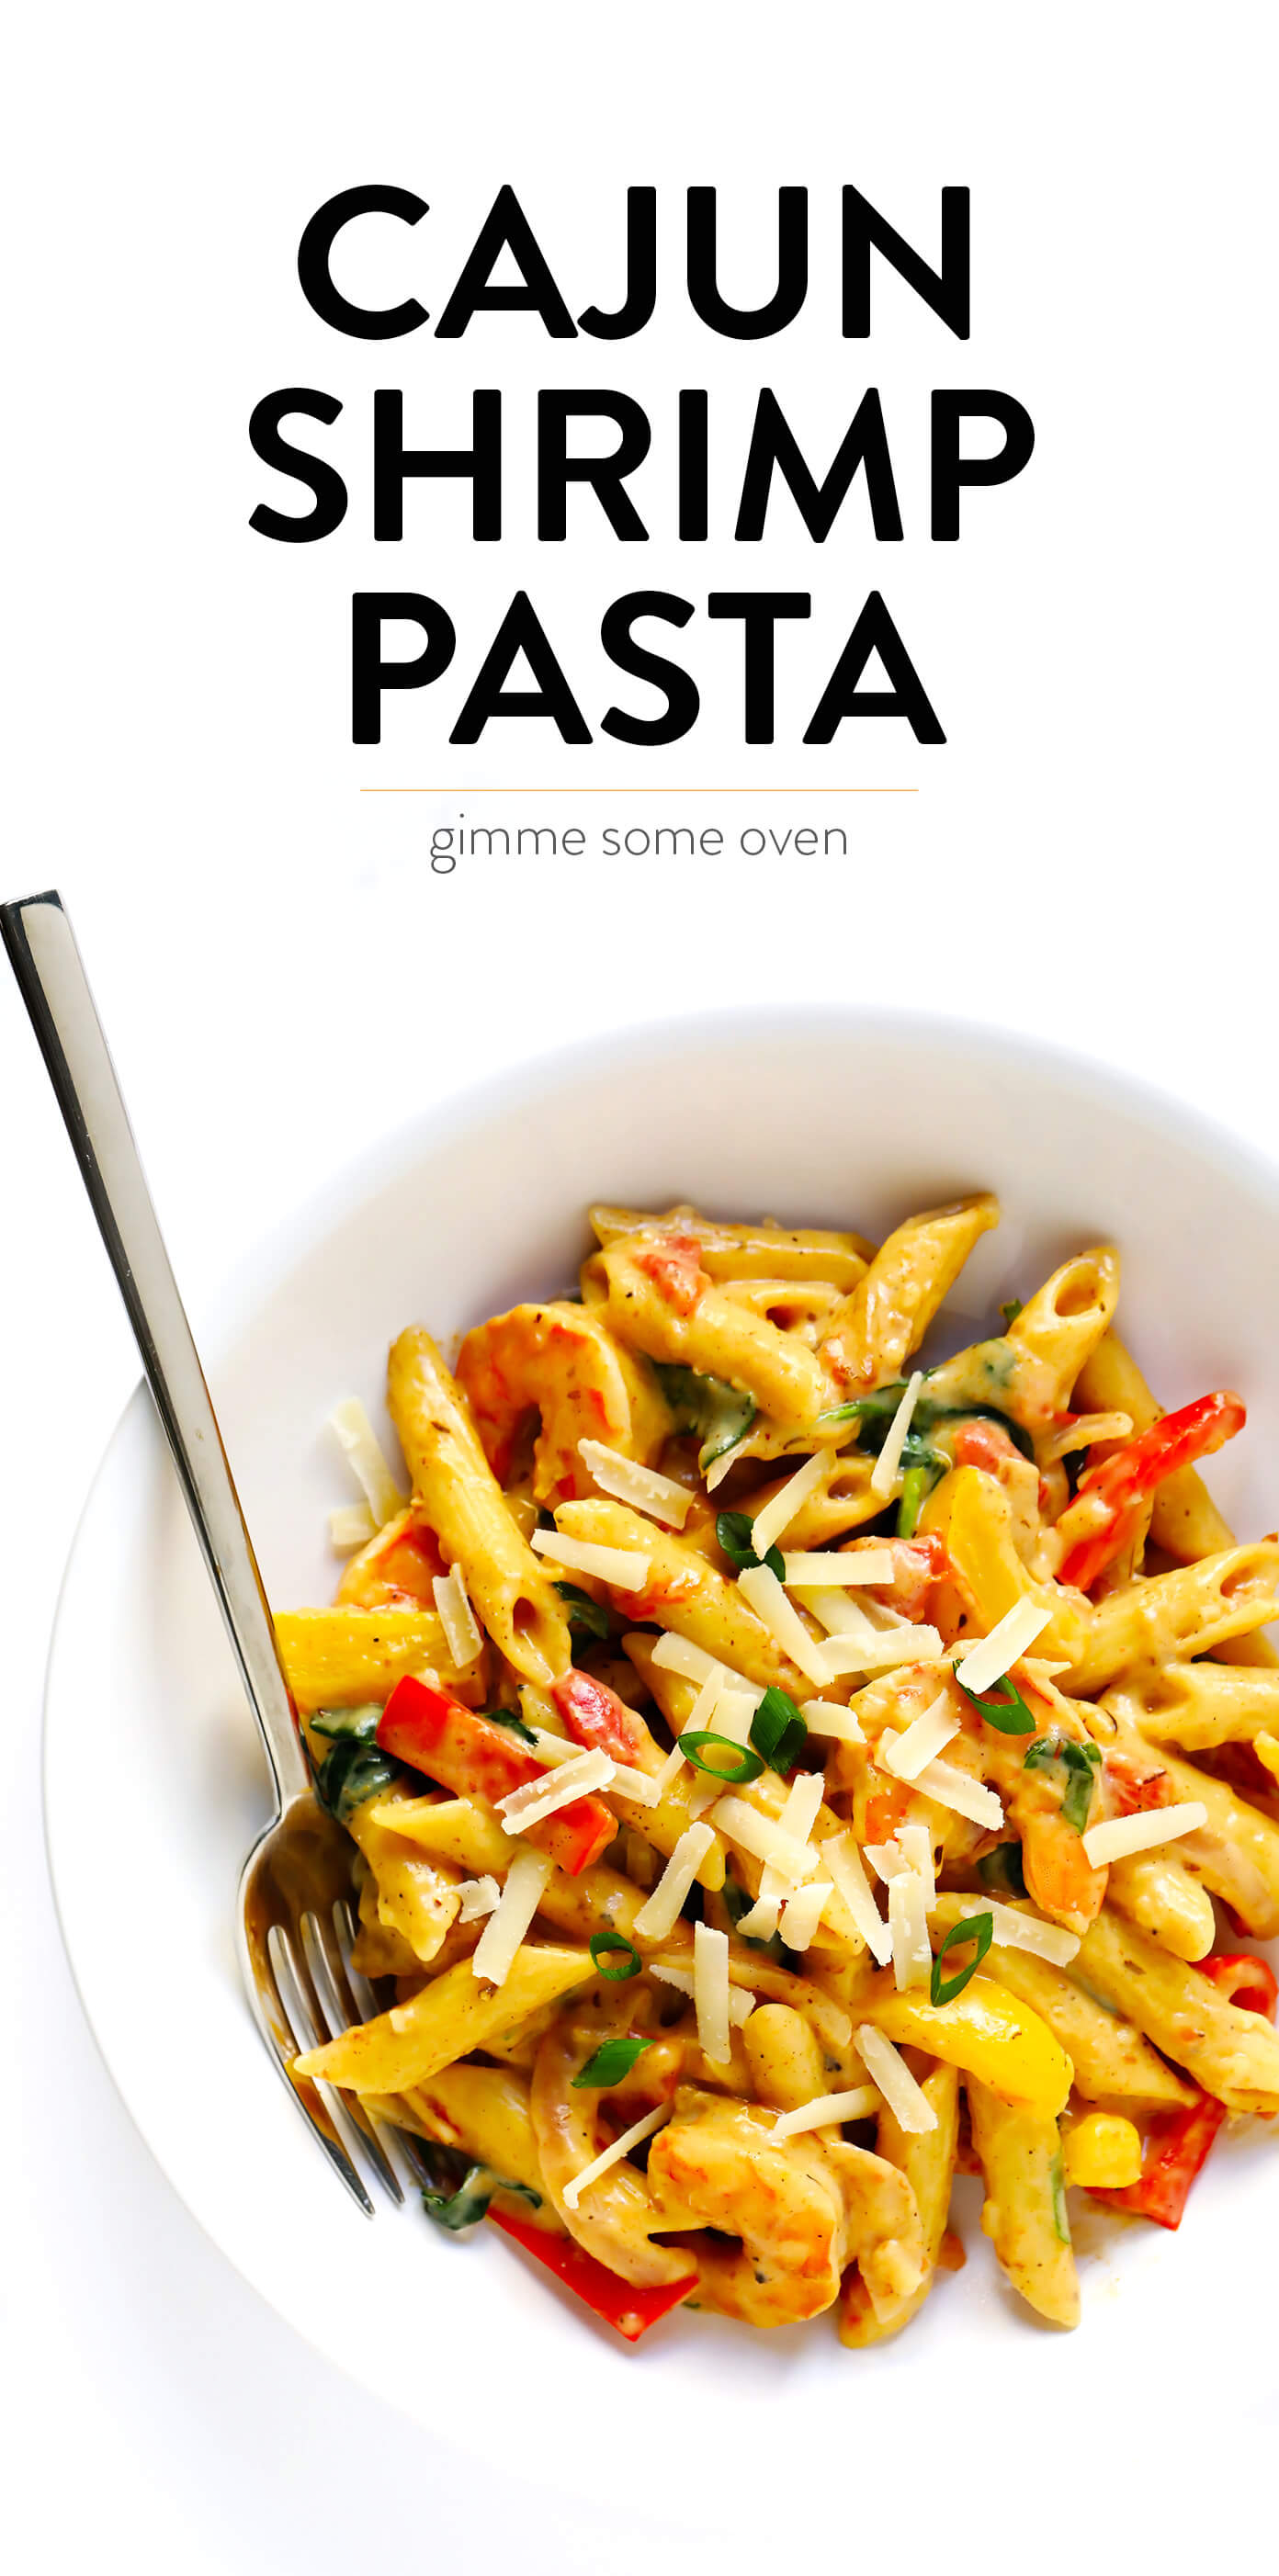 Learn italian with sabrina